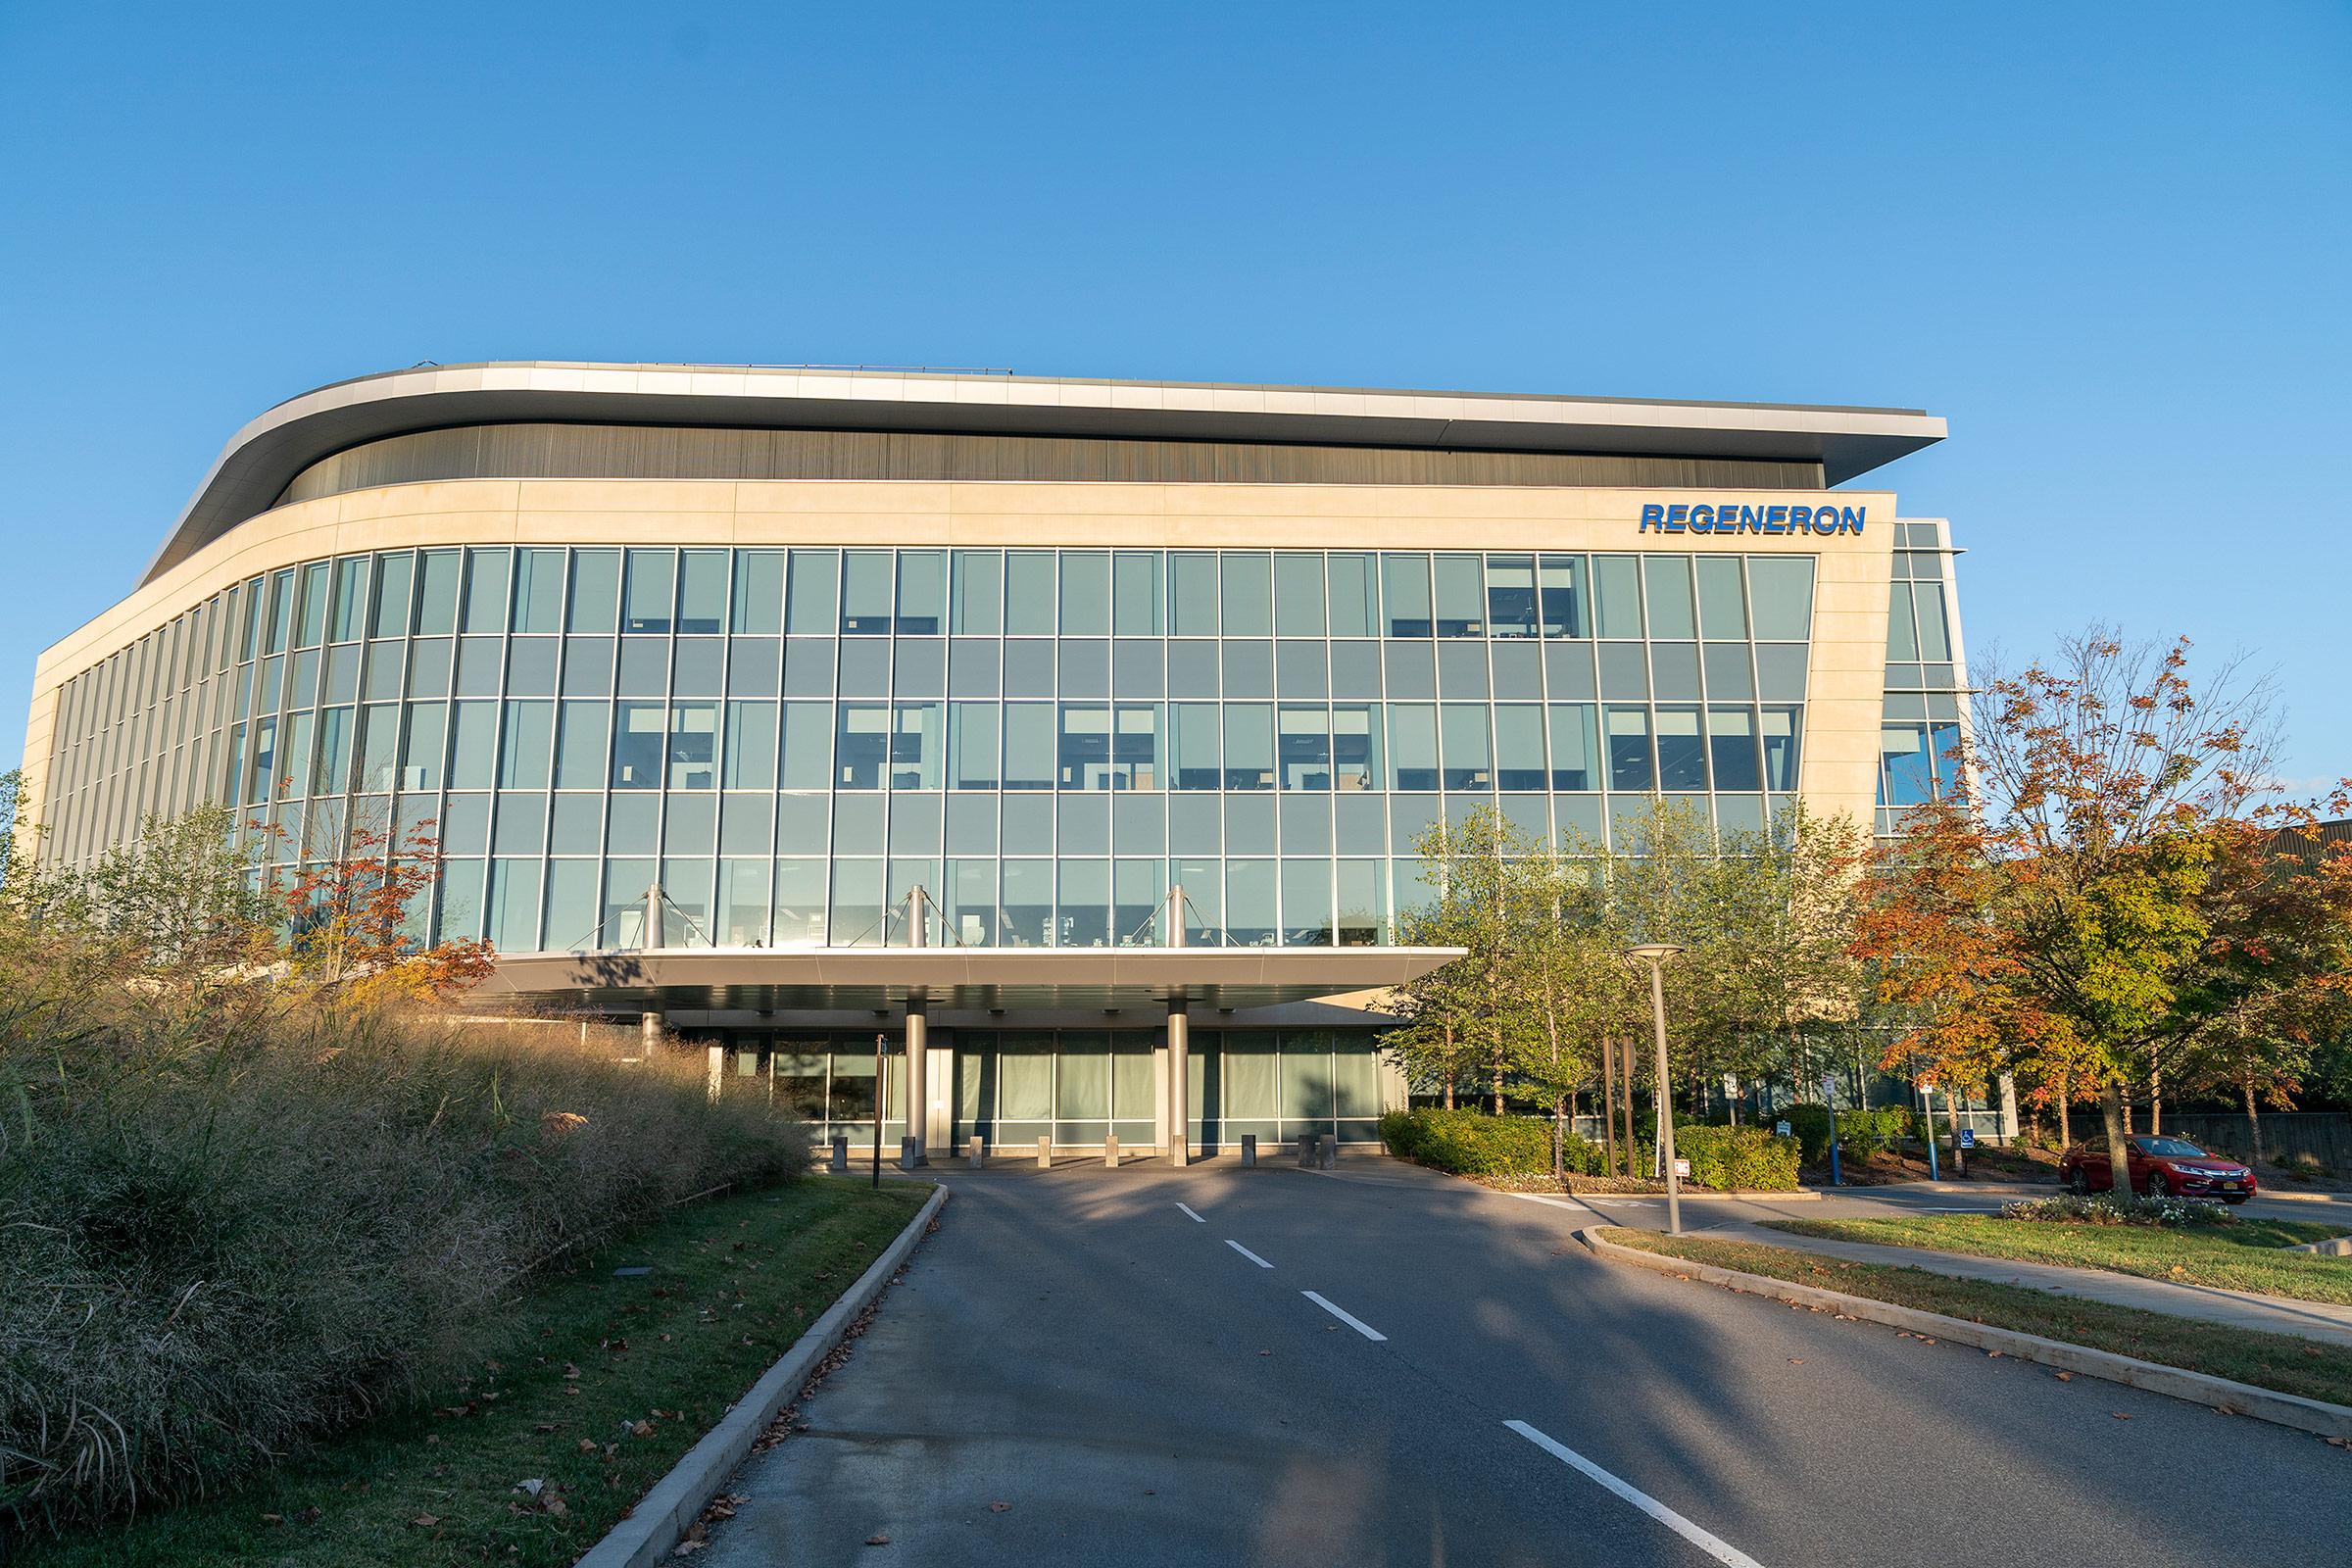 Regeneron Pharmaceuticals Inc headquarters in Tarrytown, New York.